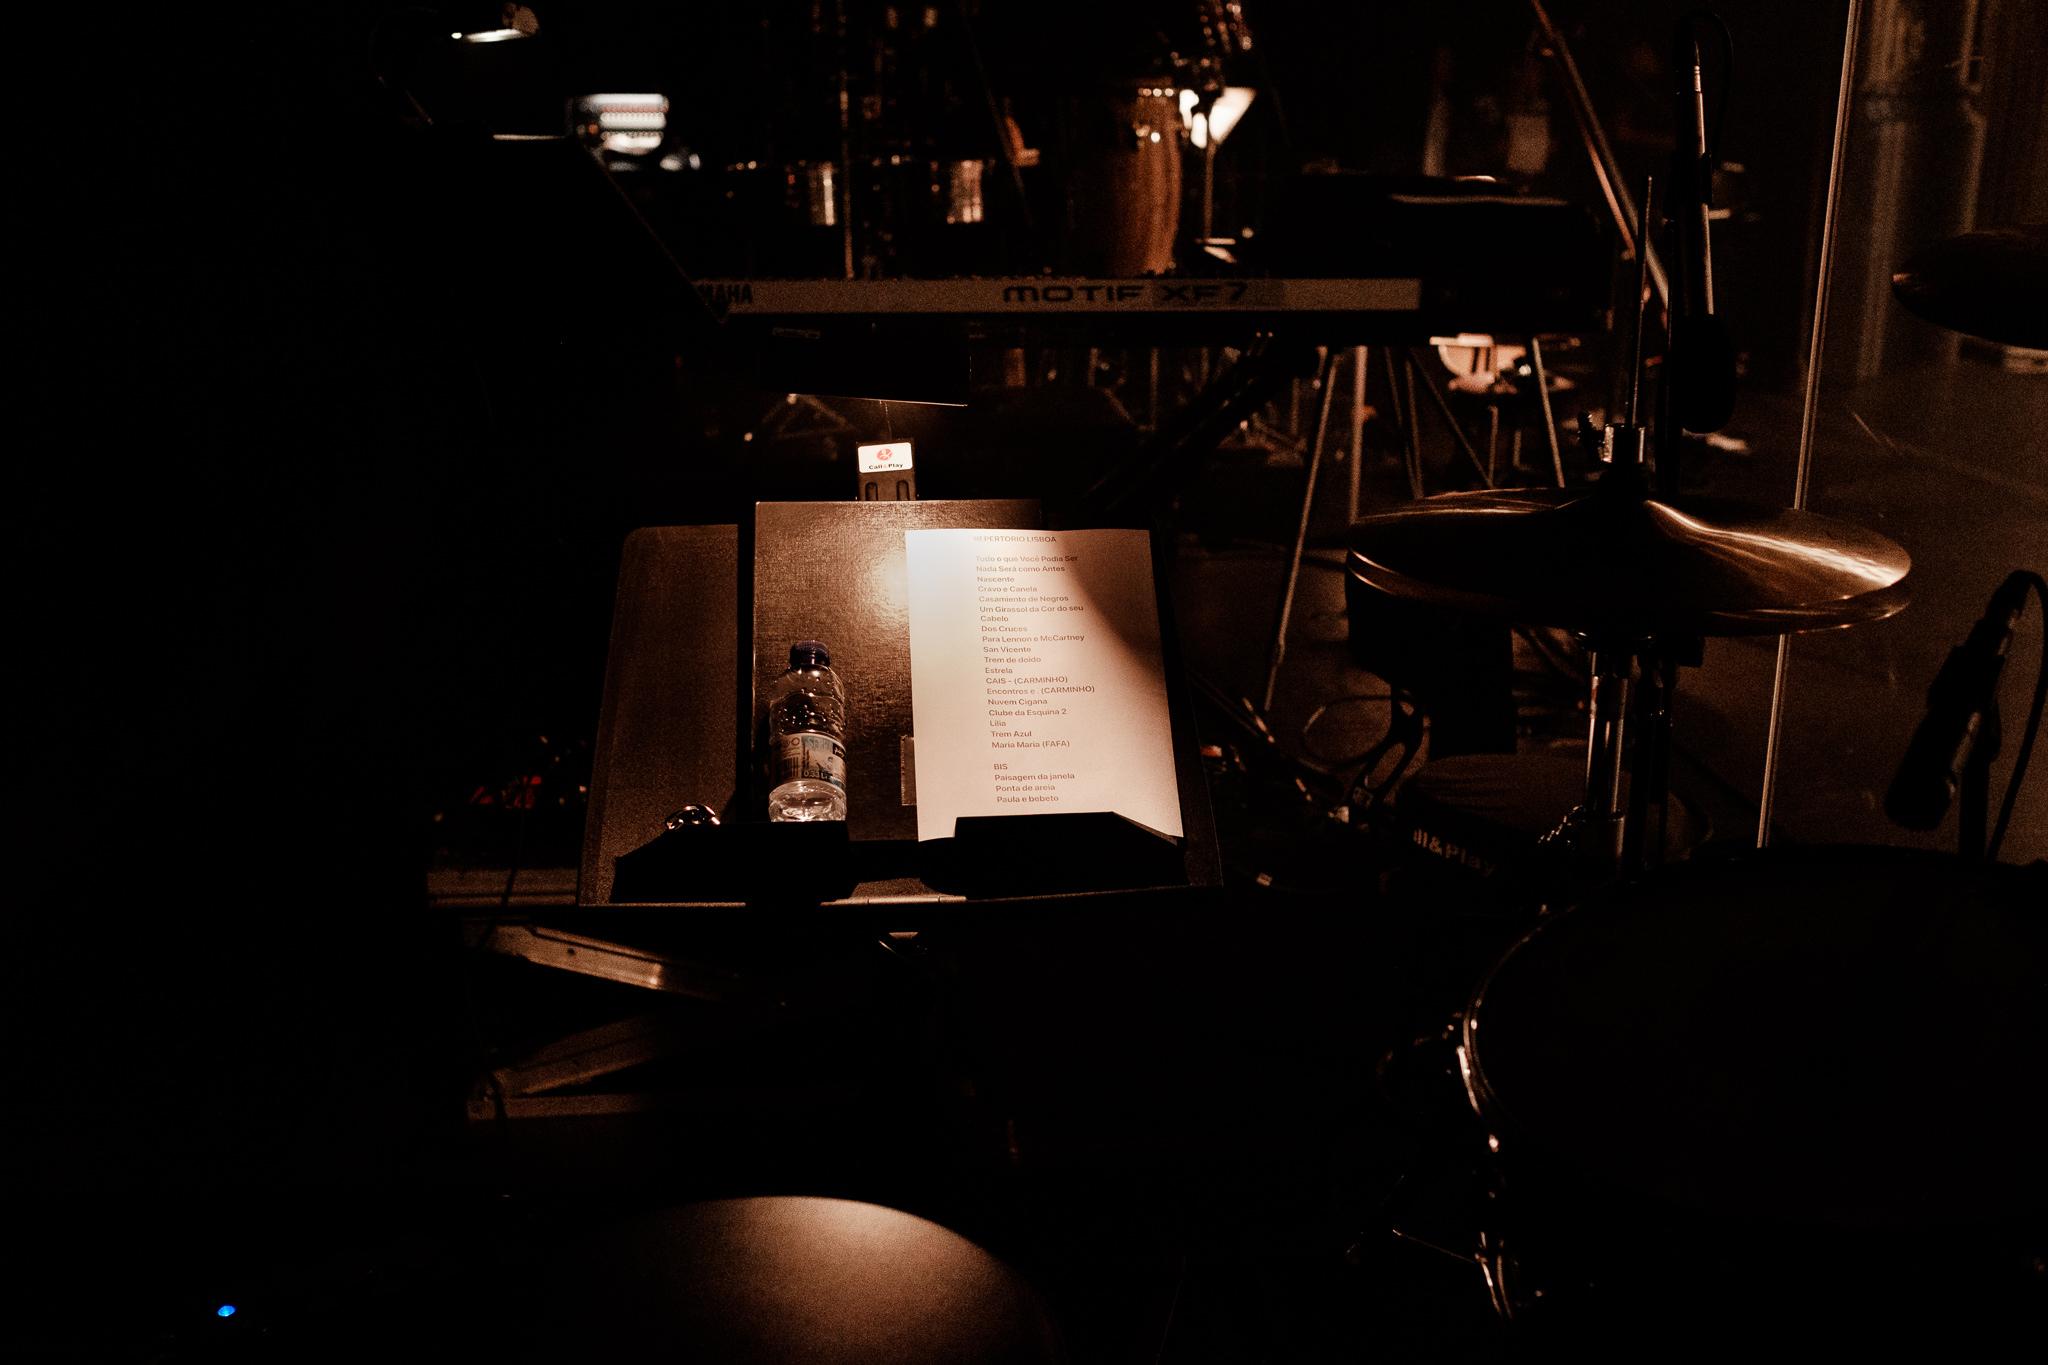 Milton Nascimento - Coliseu (Thrall Photography) - 0003.jpg